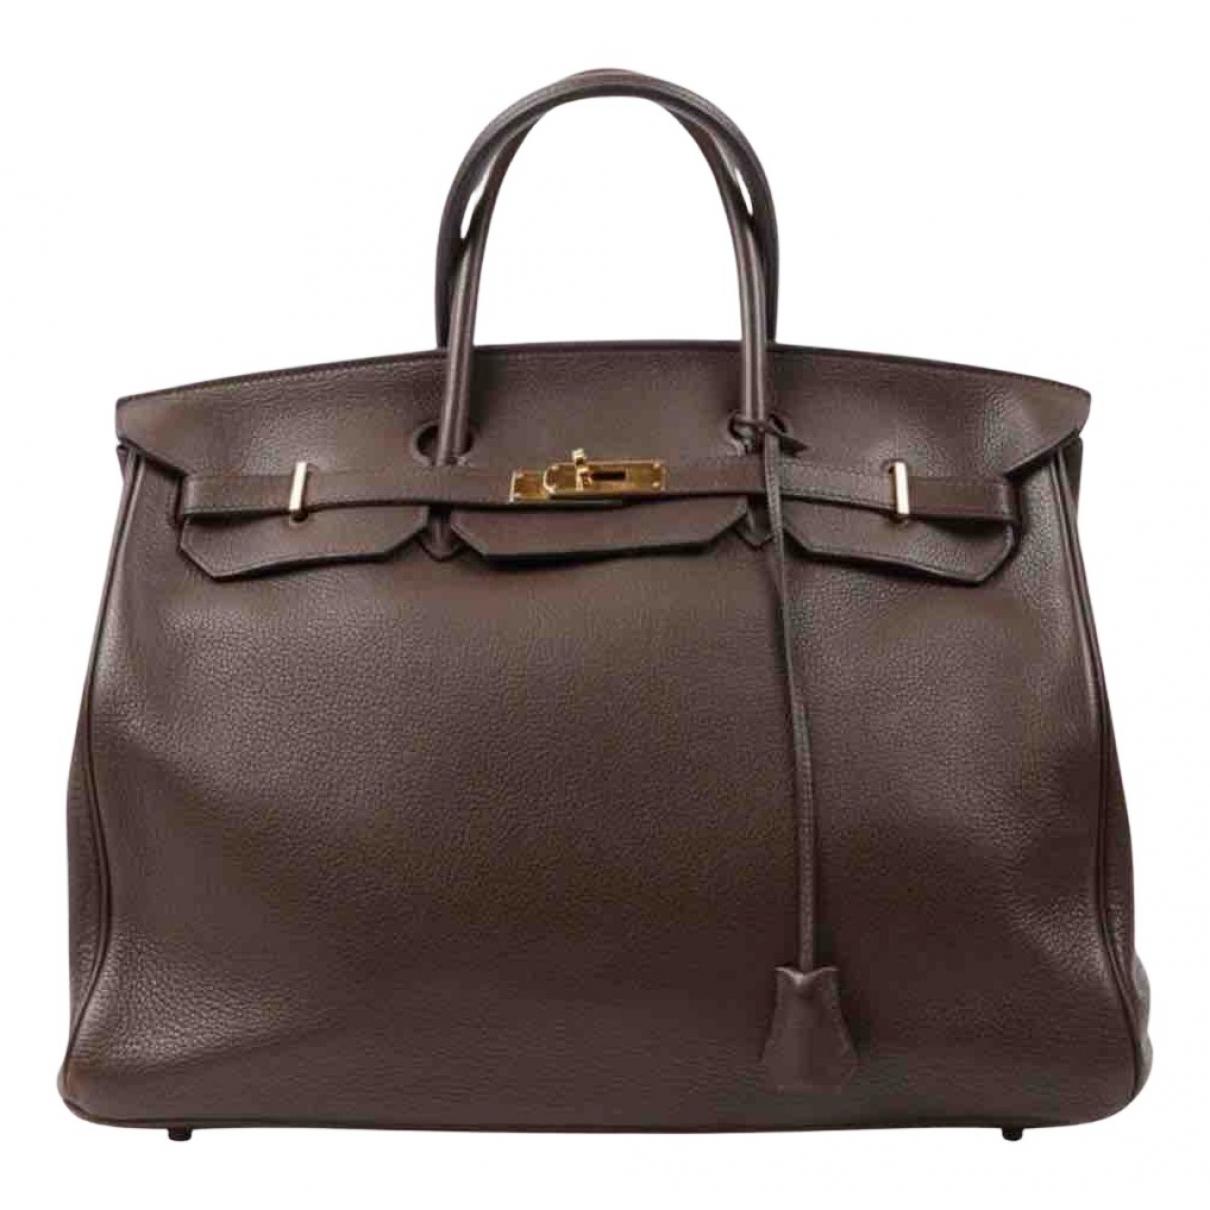 Hermes - Sac a main Birkin 40 pour femme en cuir - marron